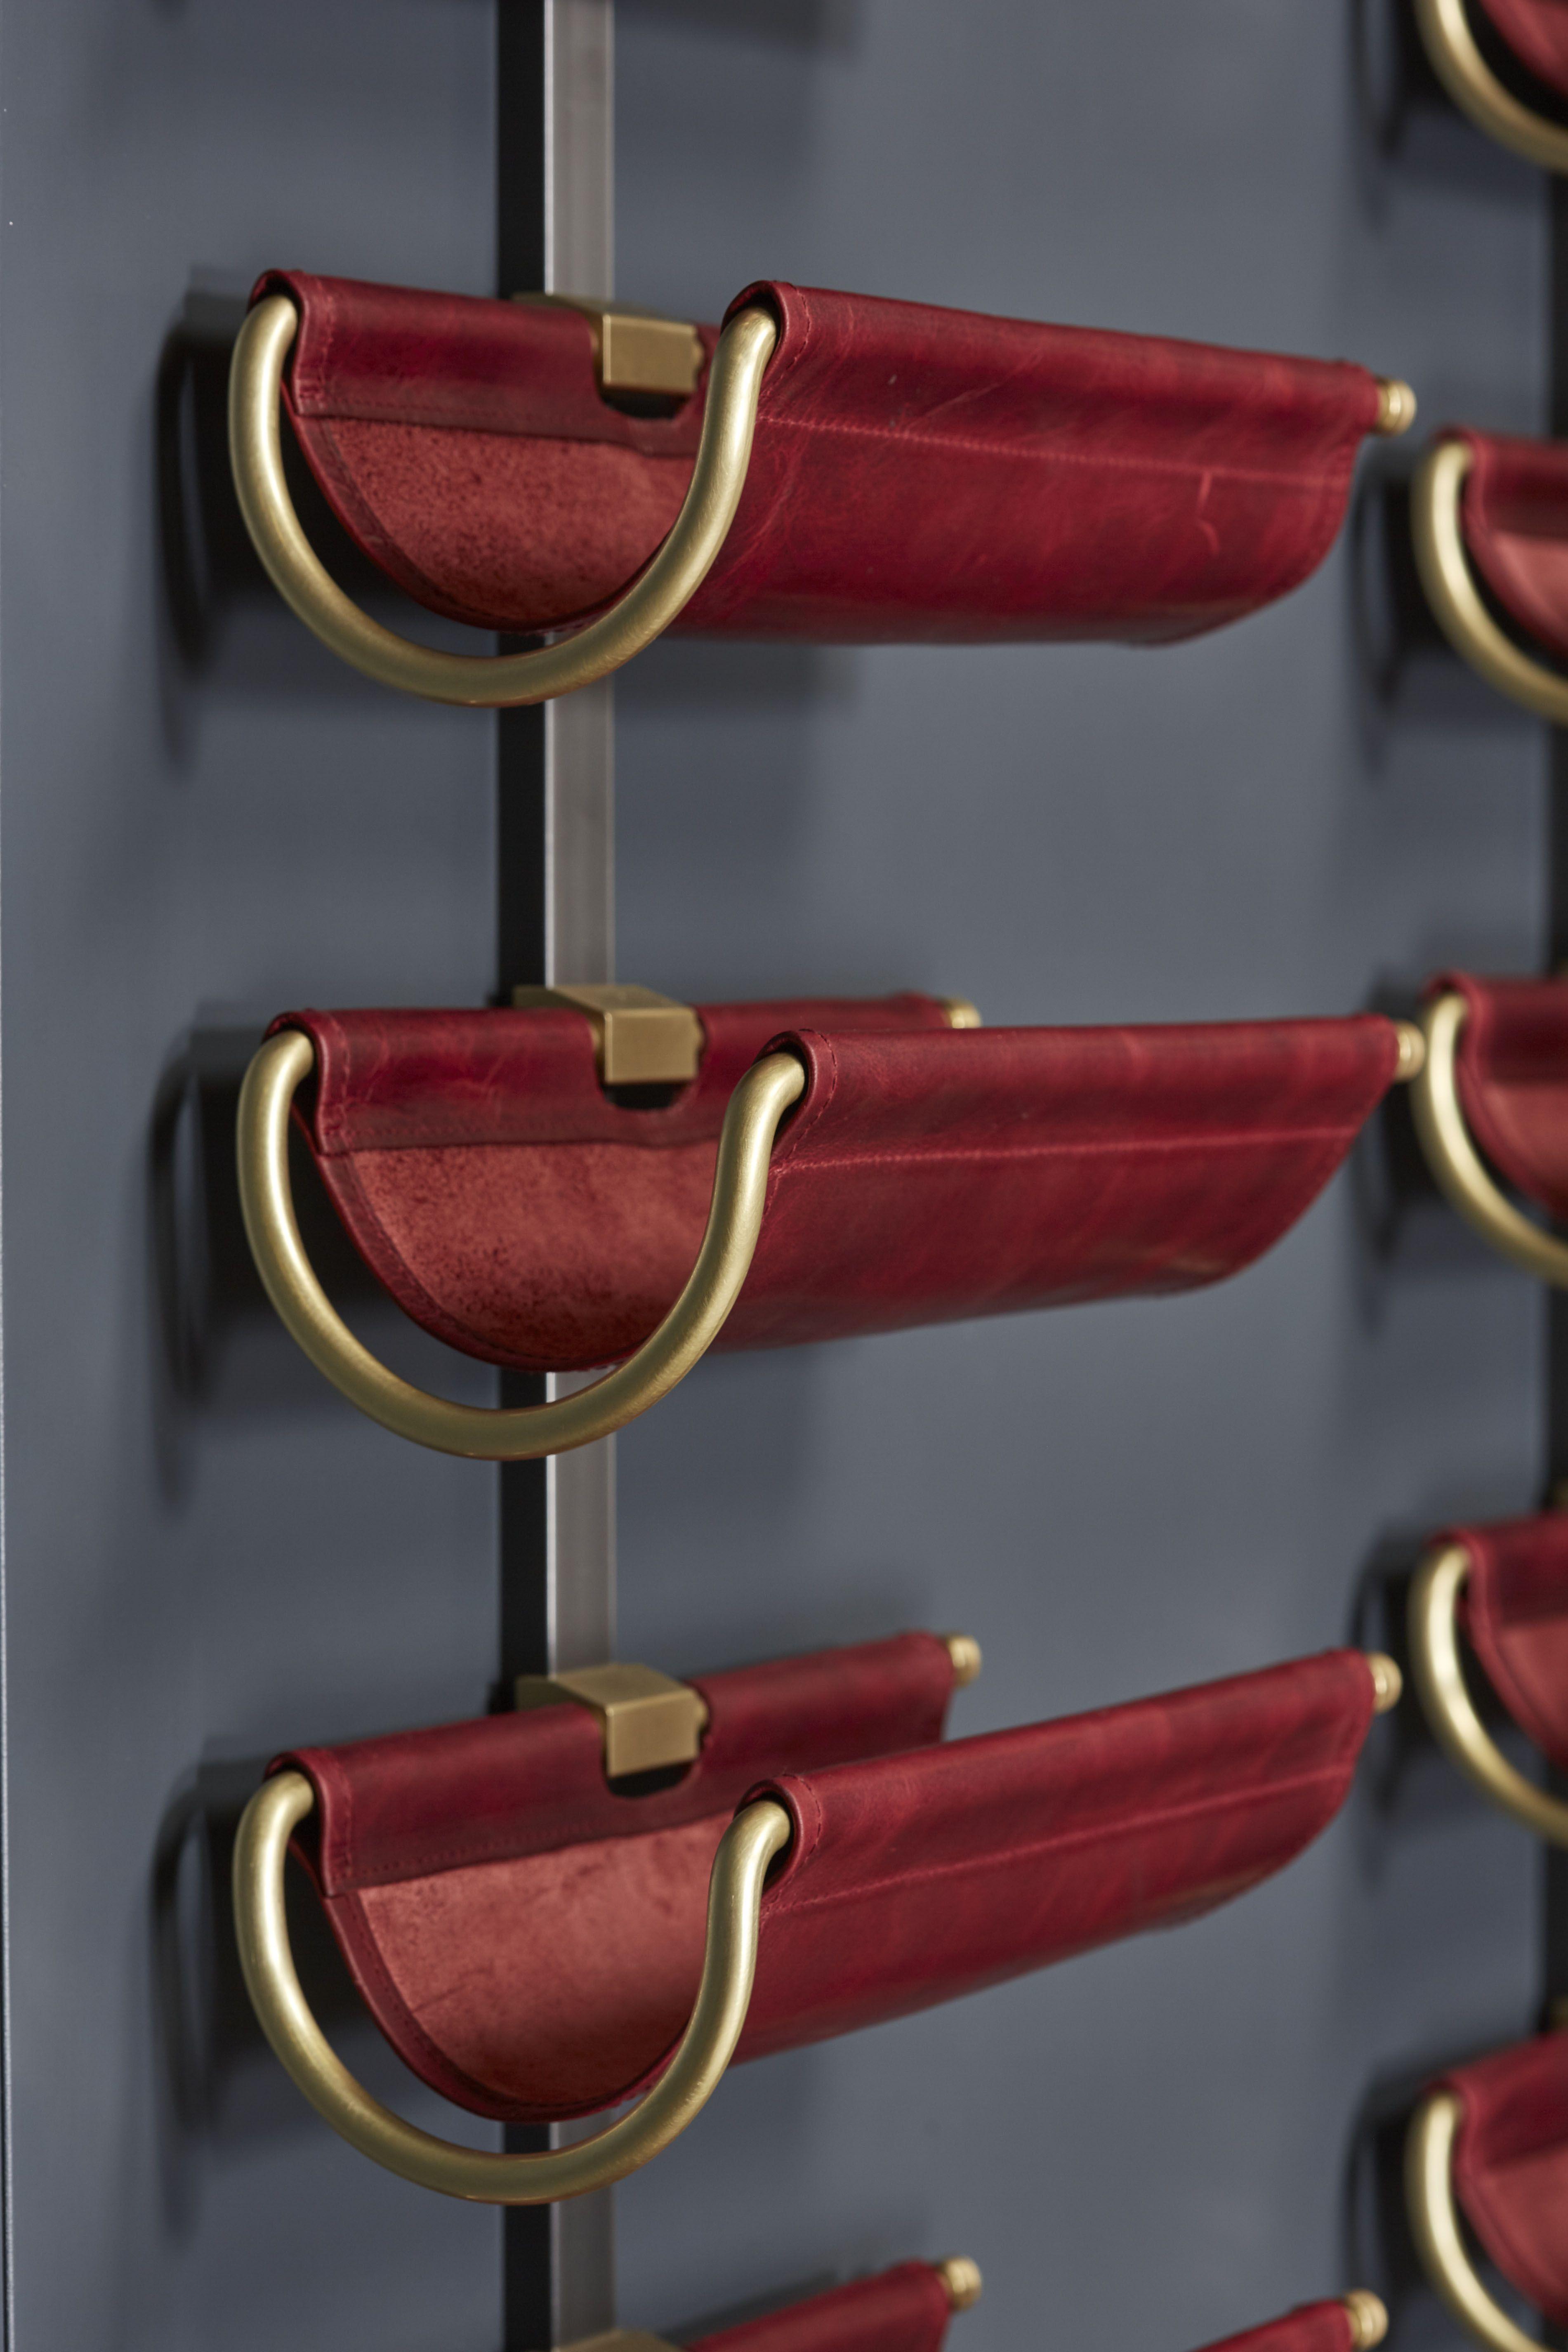 Amuneal Custom Display Fabrication Magnetic Saddle Shielding Unit Wine Wine Saddle Display Unit Amuneal Ma In 2020 Wine Room Wine Store